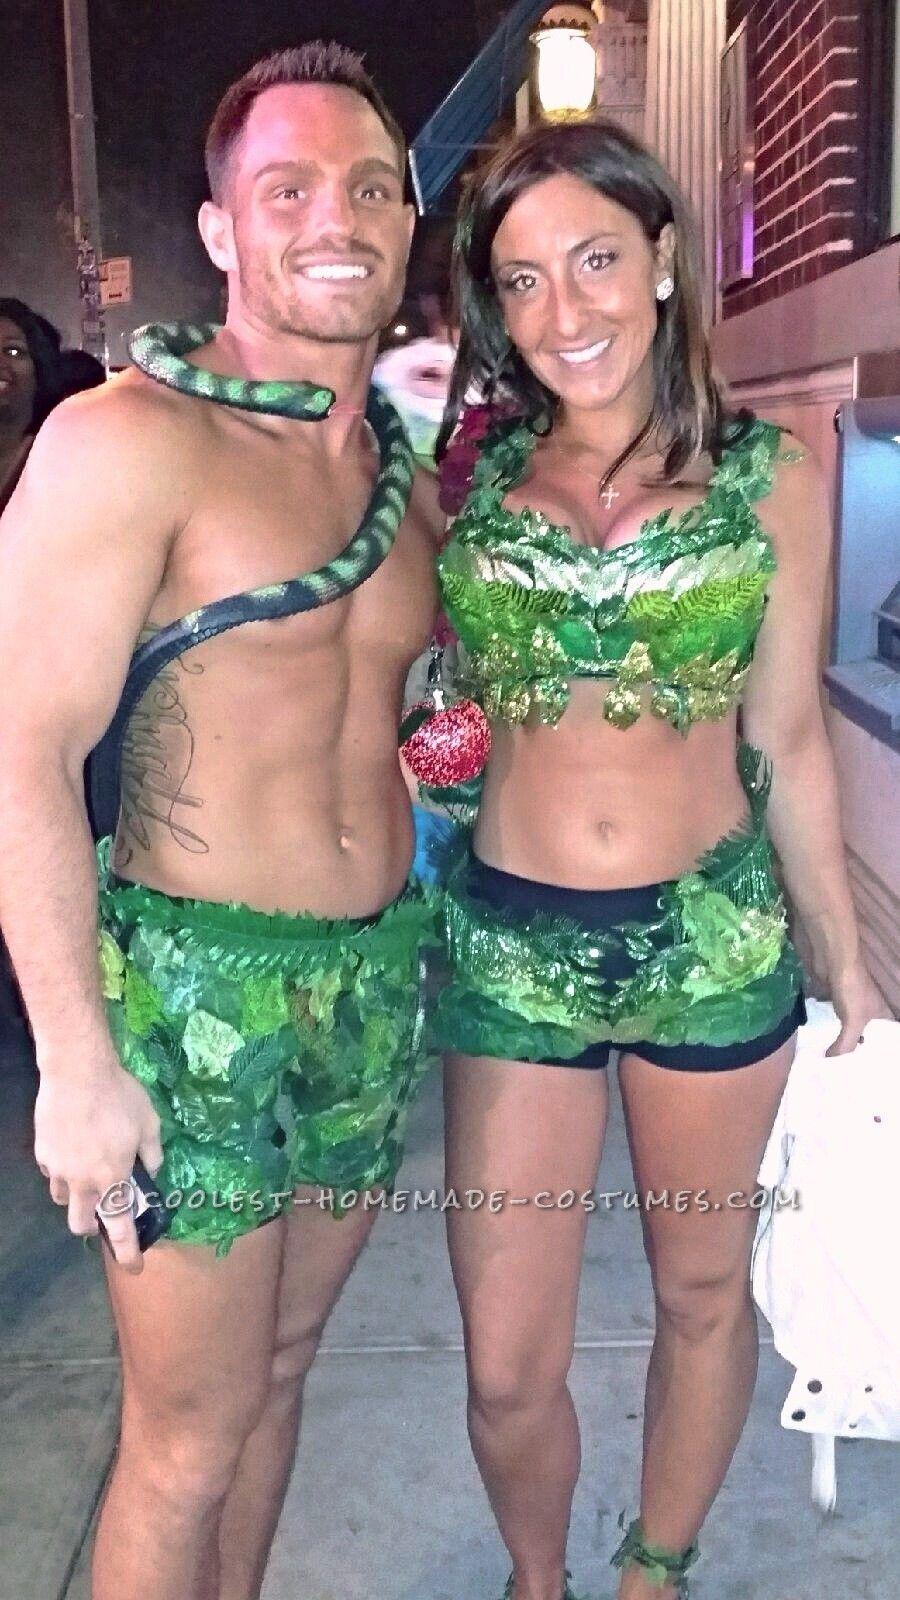 Sexy Adam and Eve Couple Halloween Costume… Coolest Halloween Costume Contest